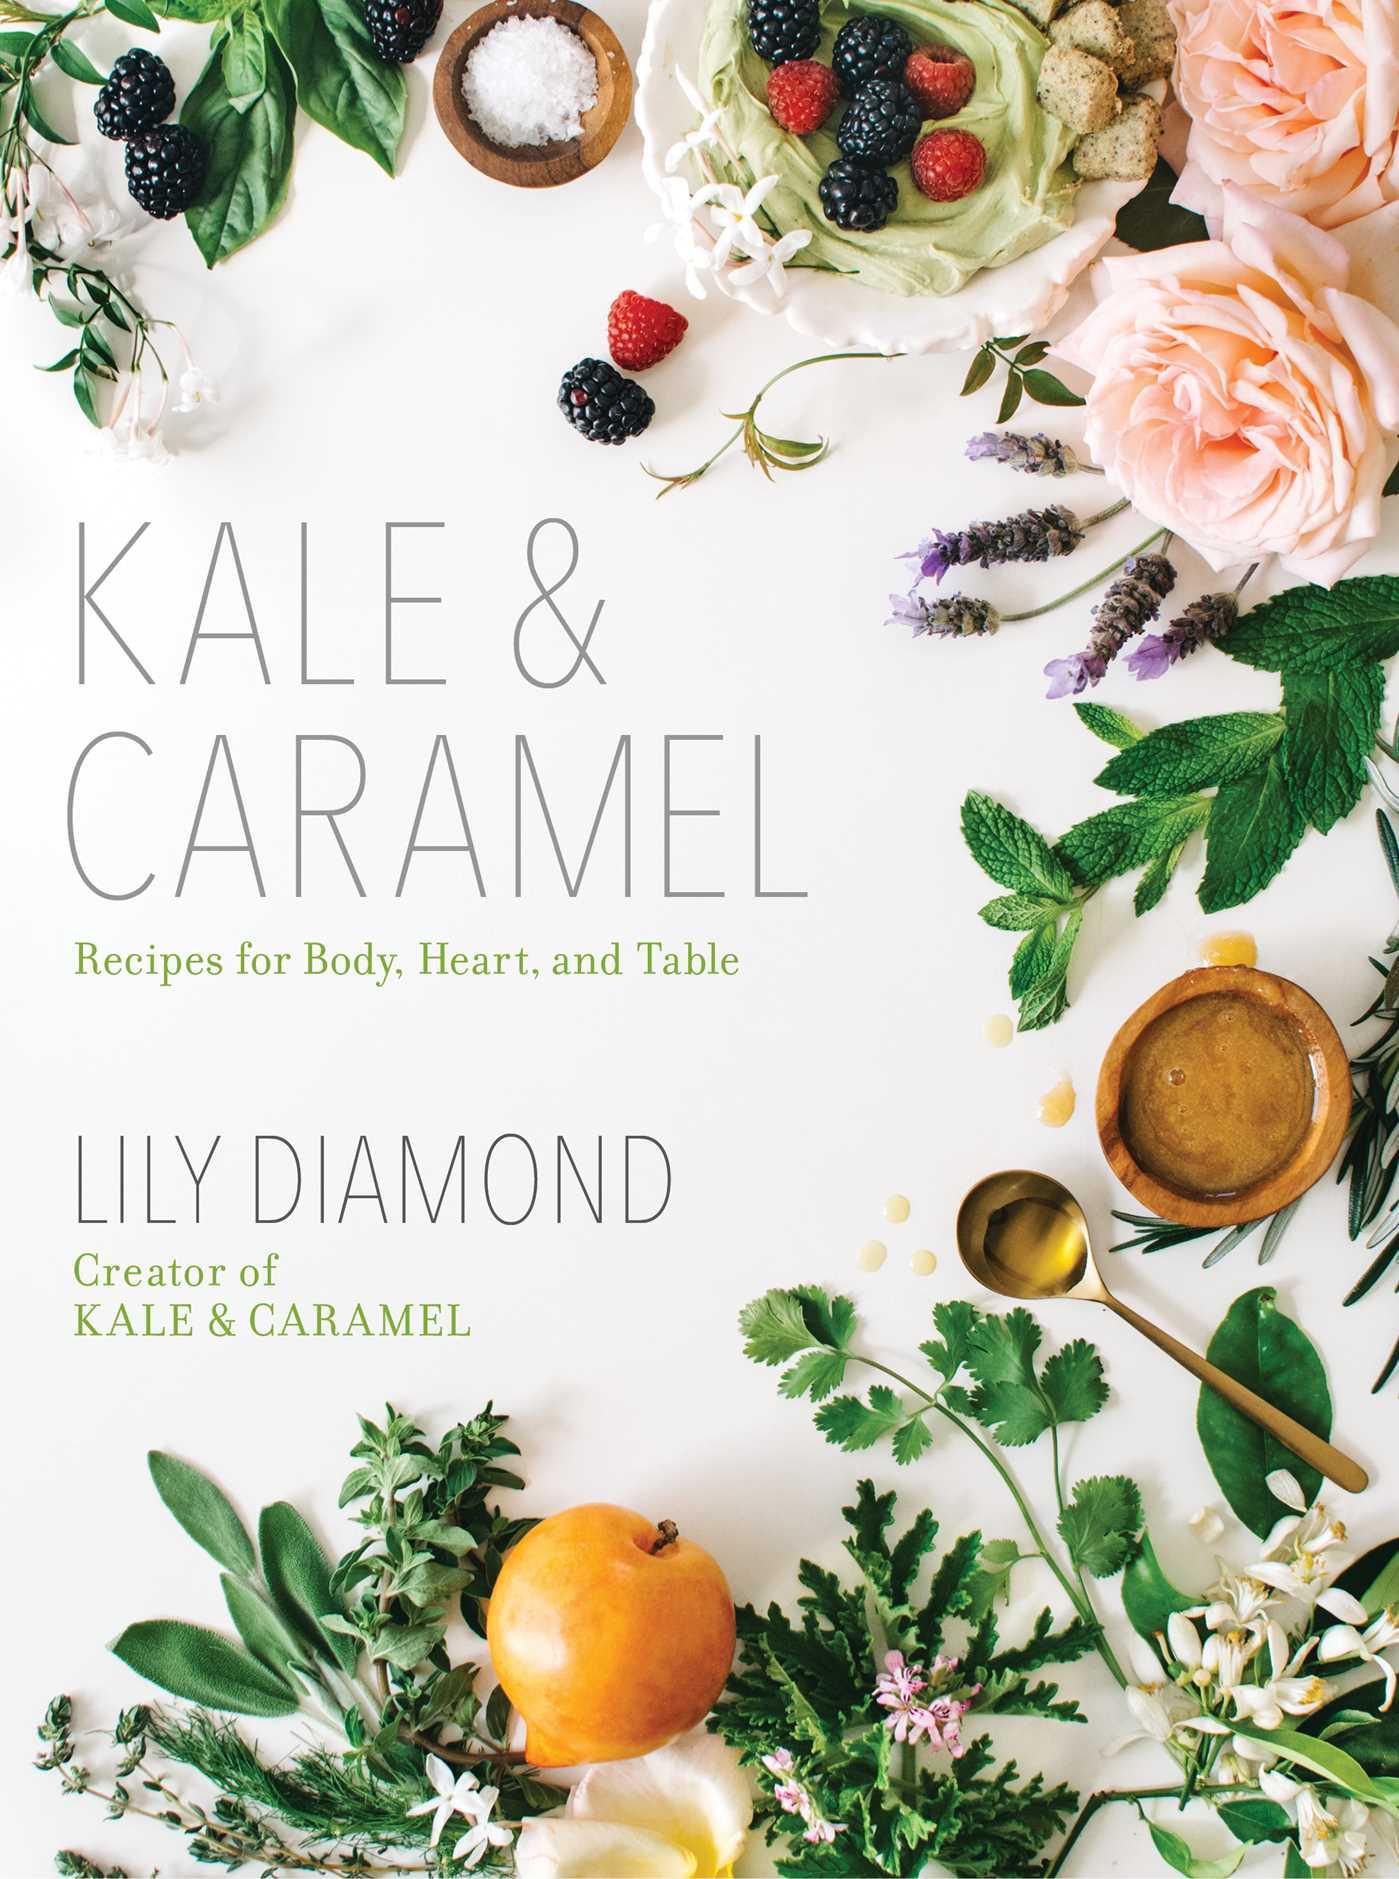 Kale caramel 9781501123399 hr